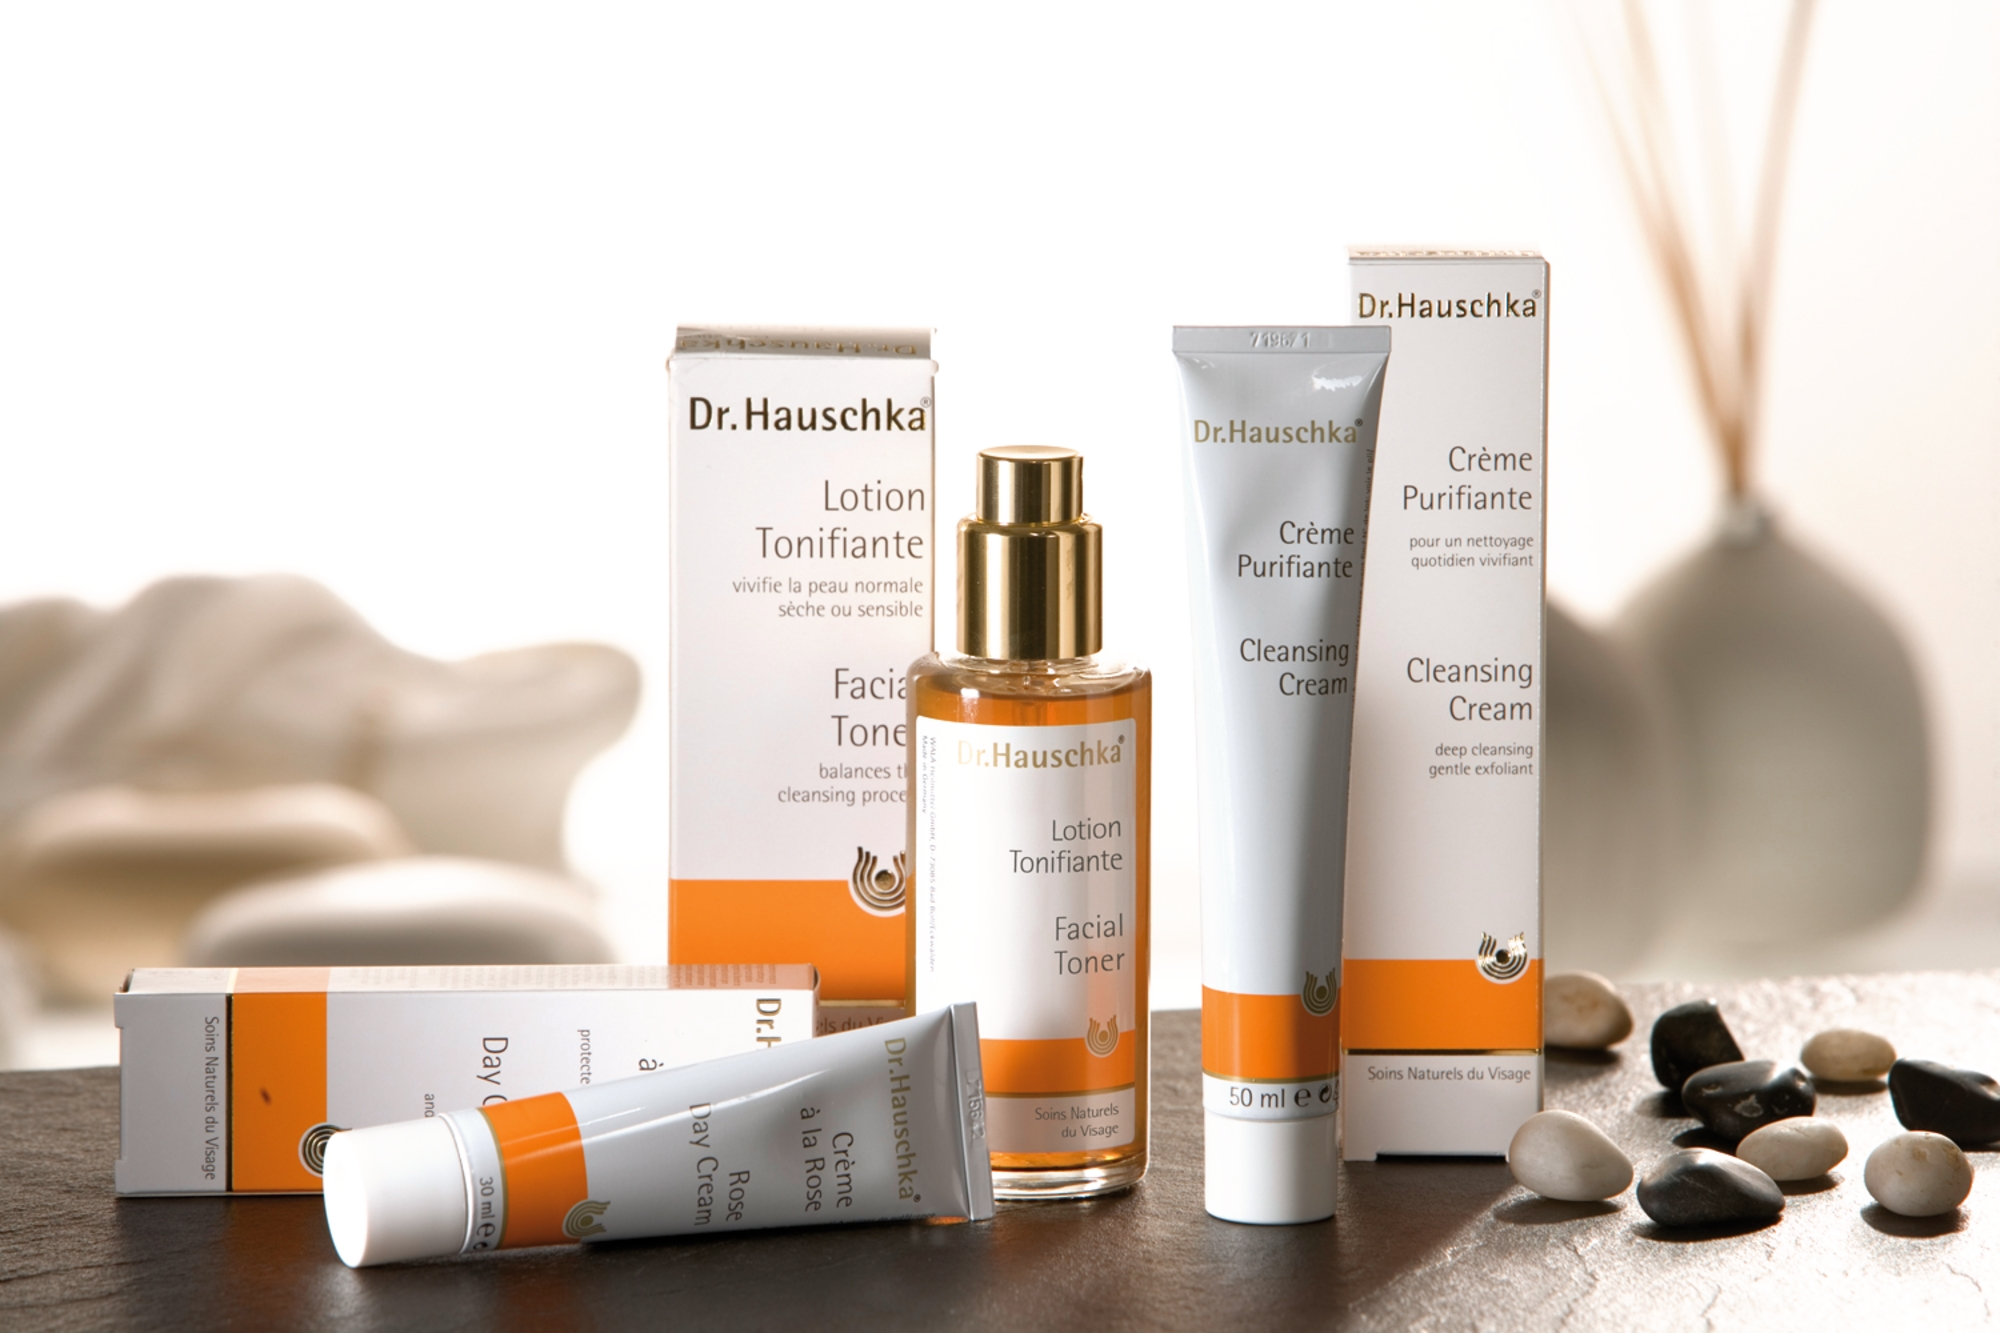 la gamme Docteur Hauschka